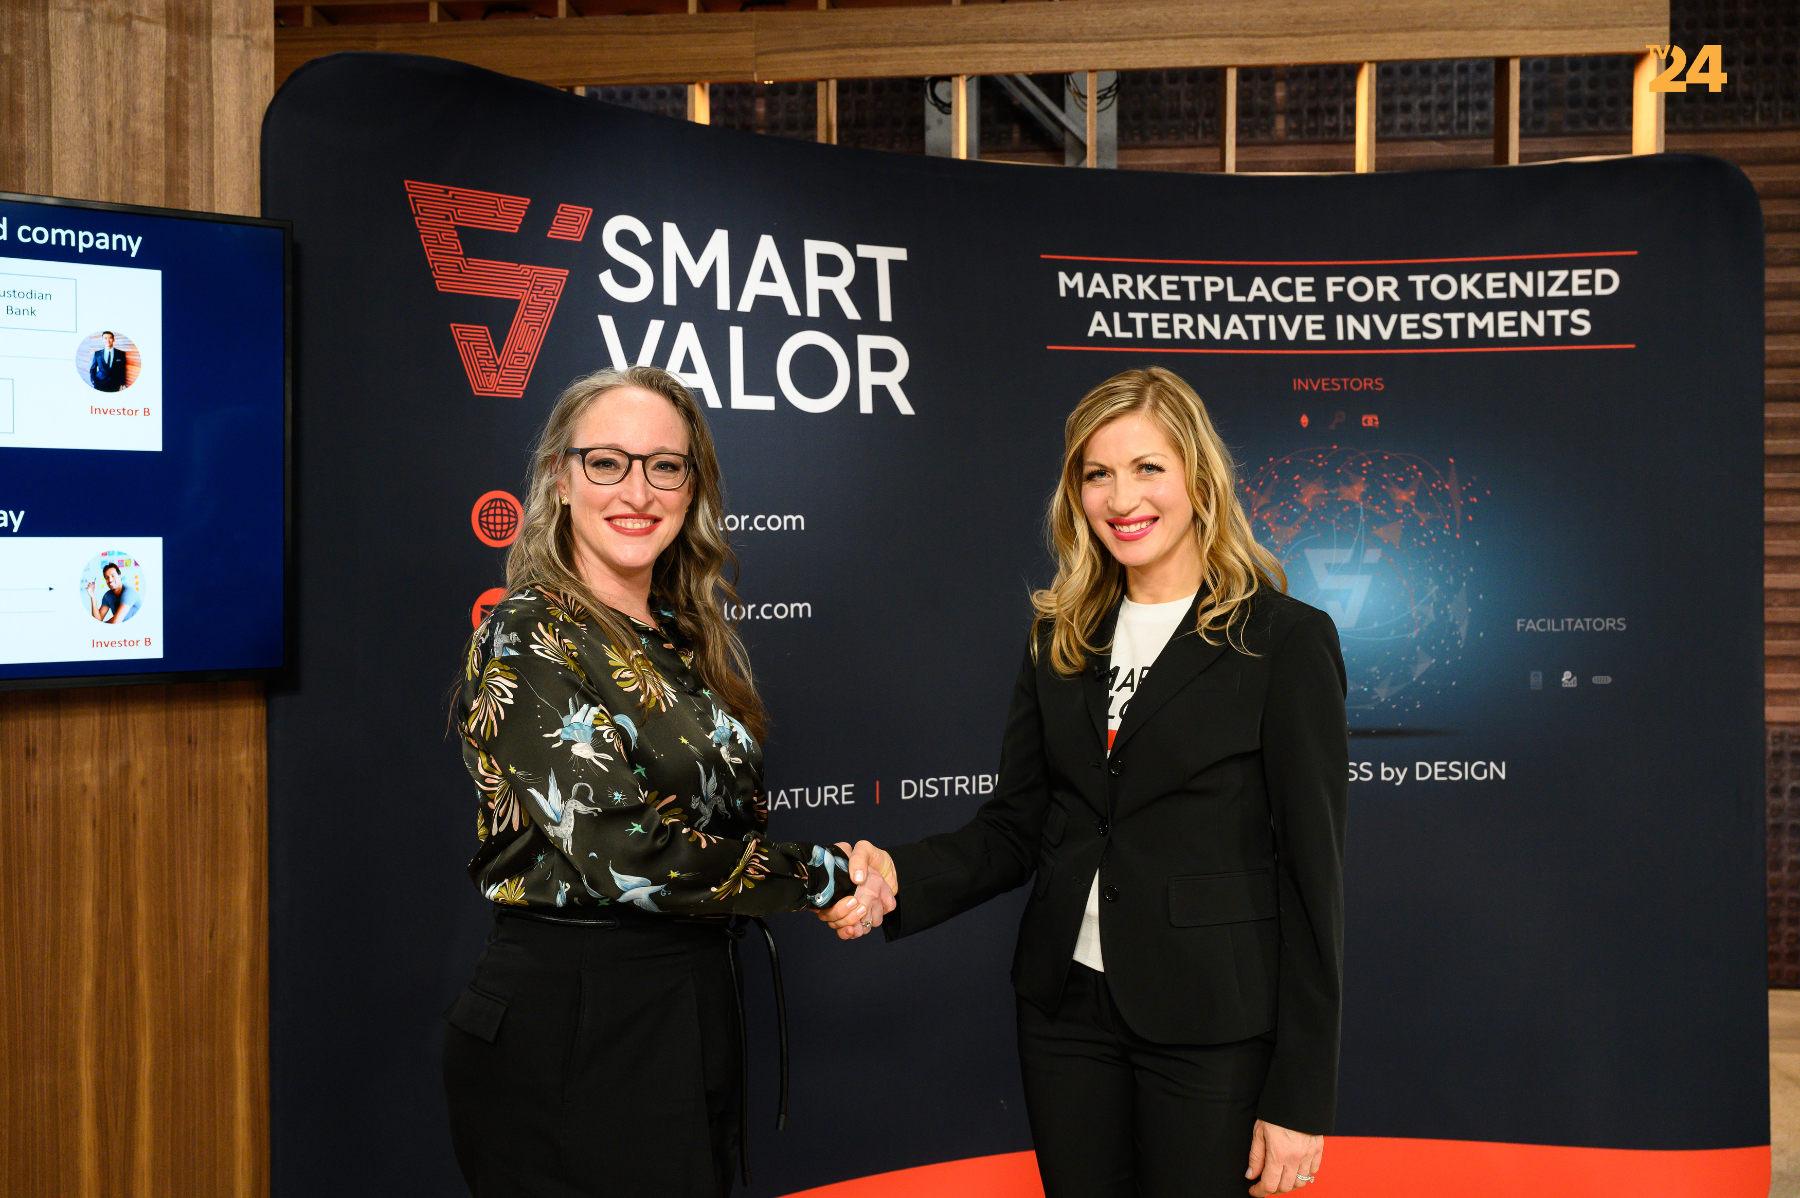 Bettina Hein and Olga Feldmeier Smart Valor